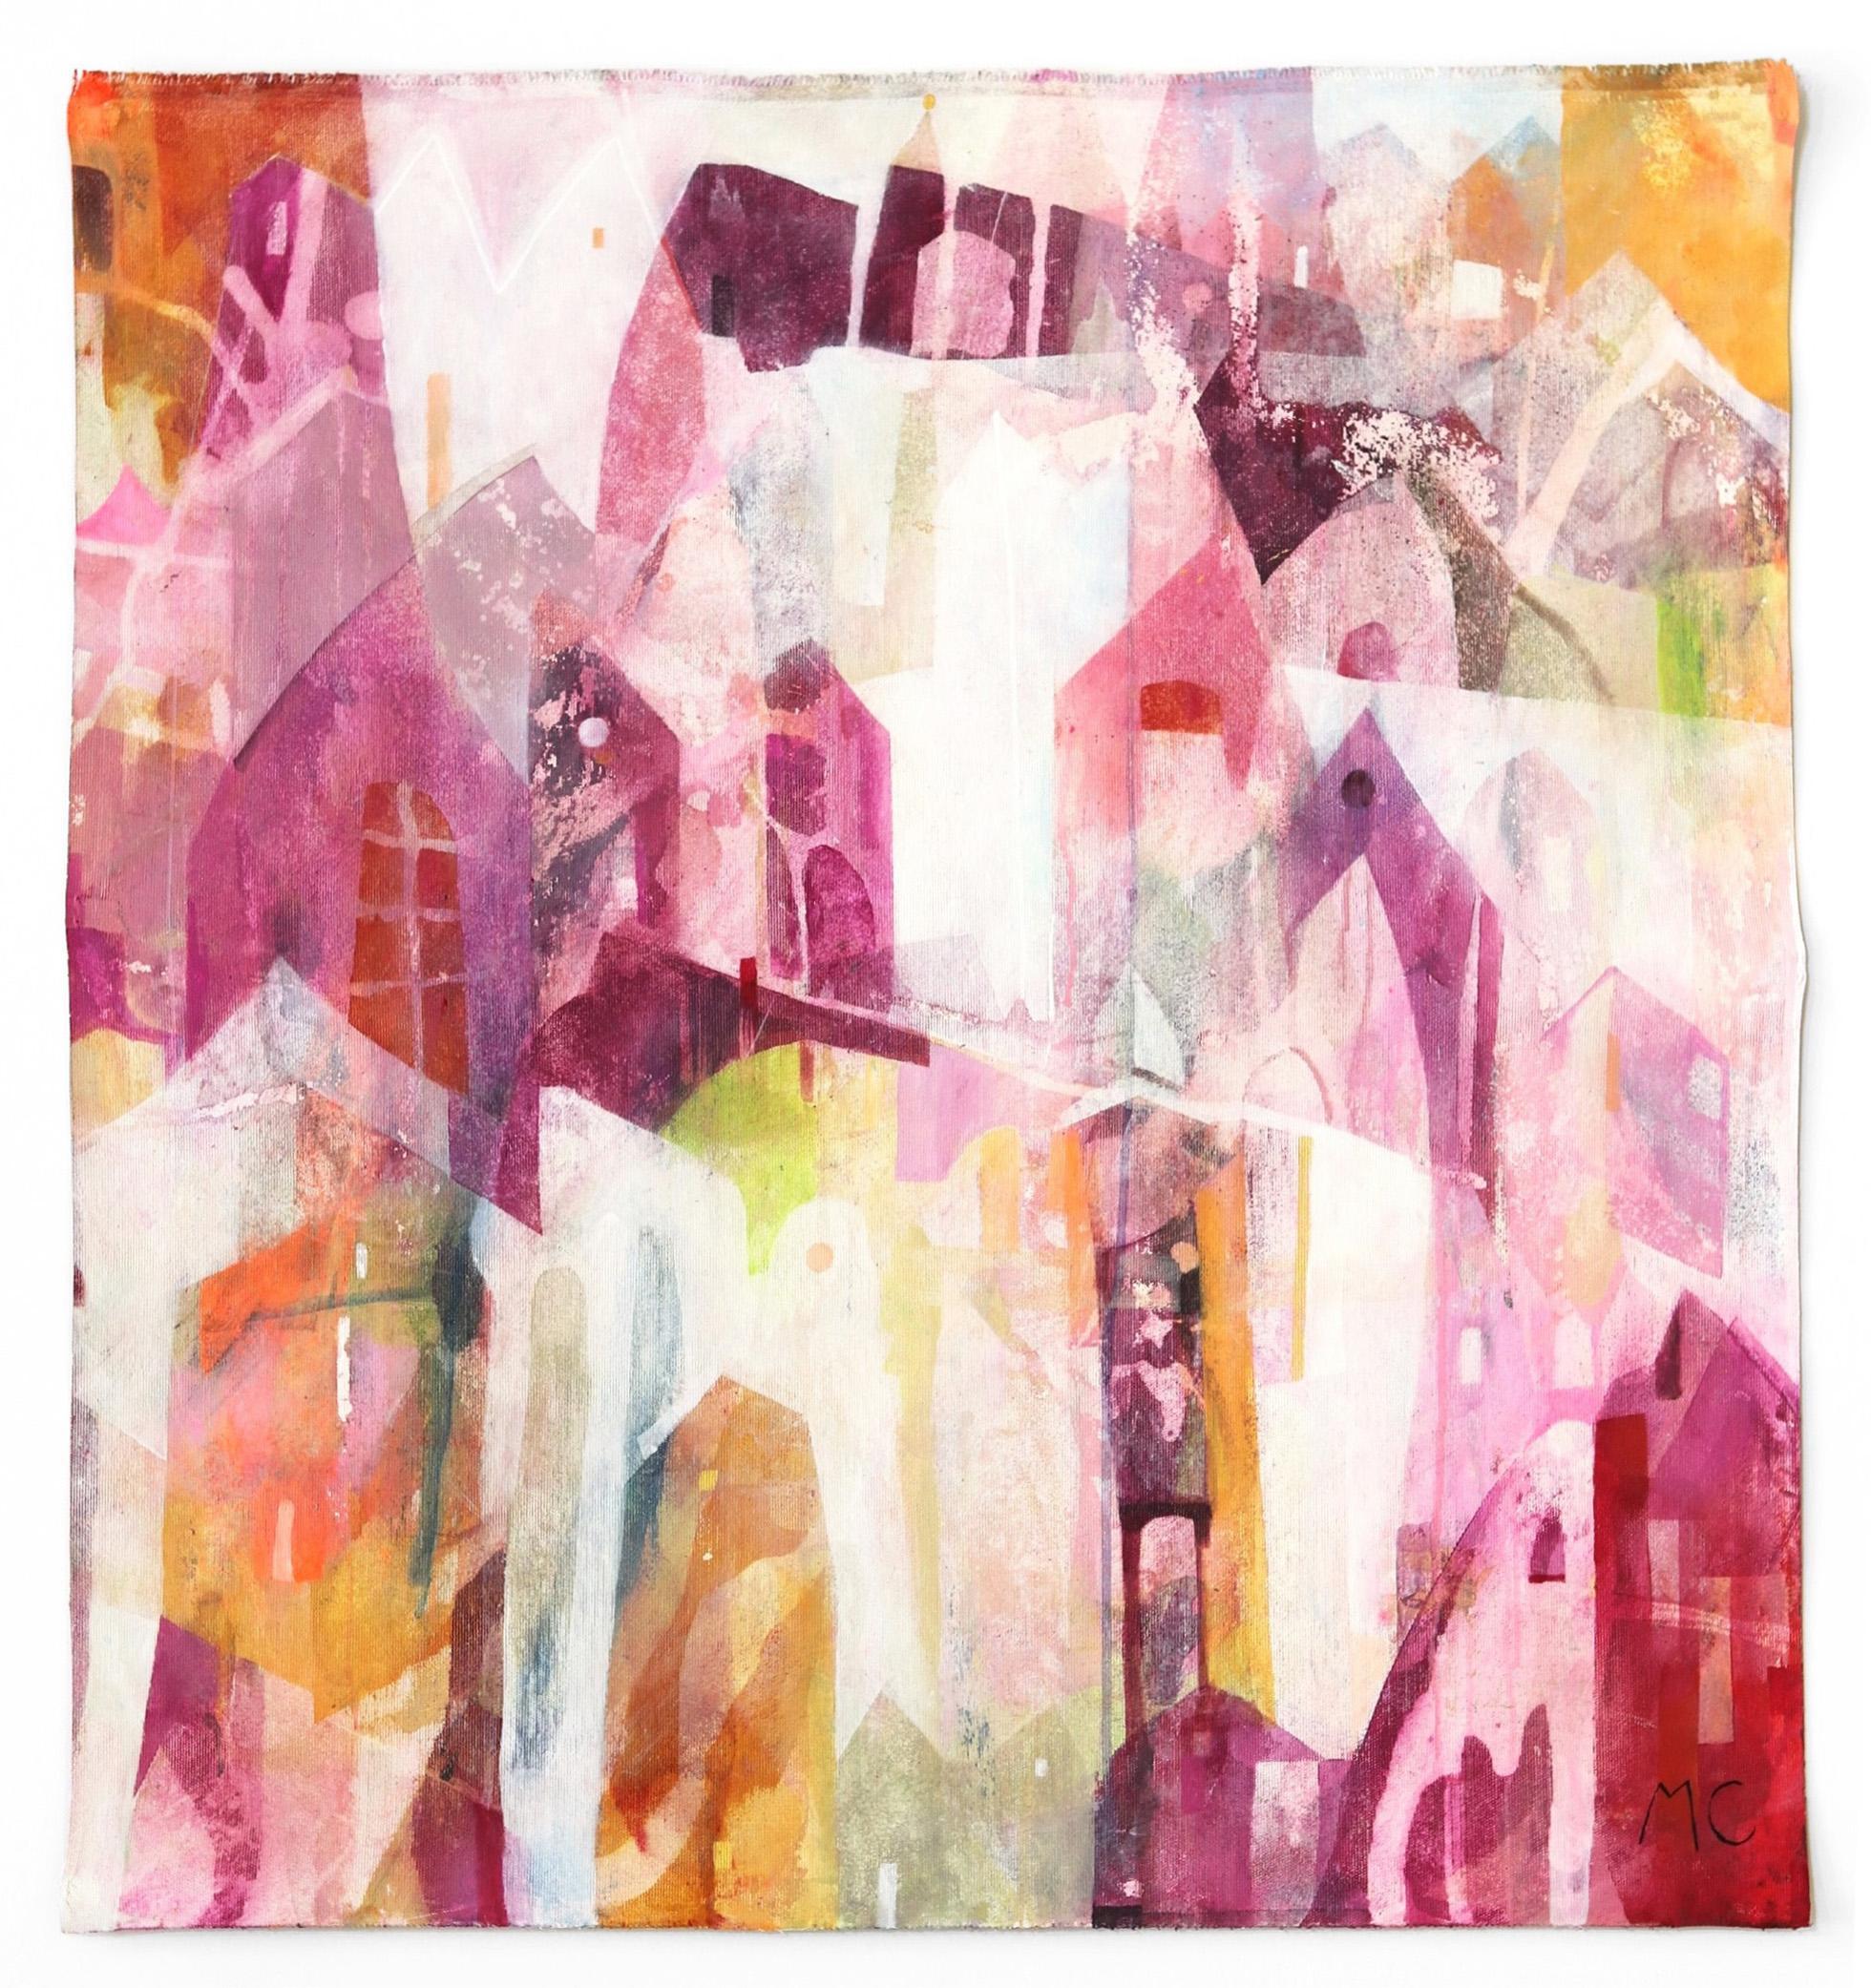 Cherish - Original Abstracted Cityscape Artwork on Canvas